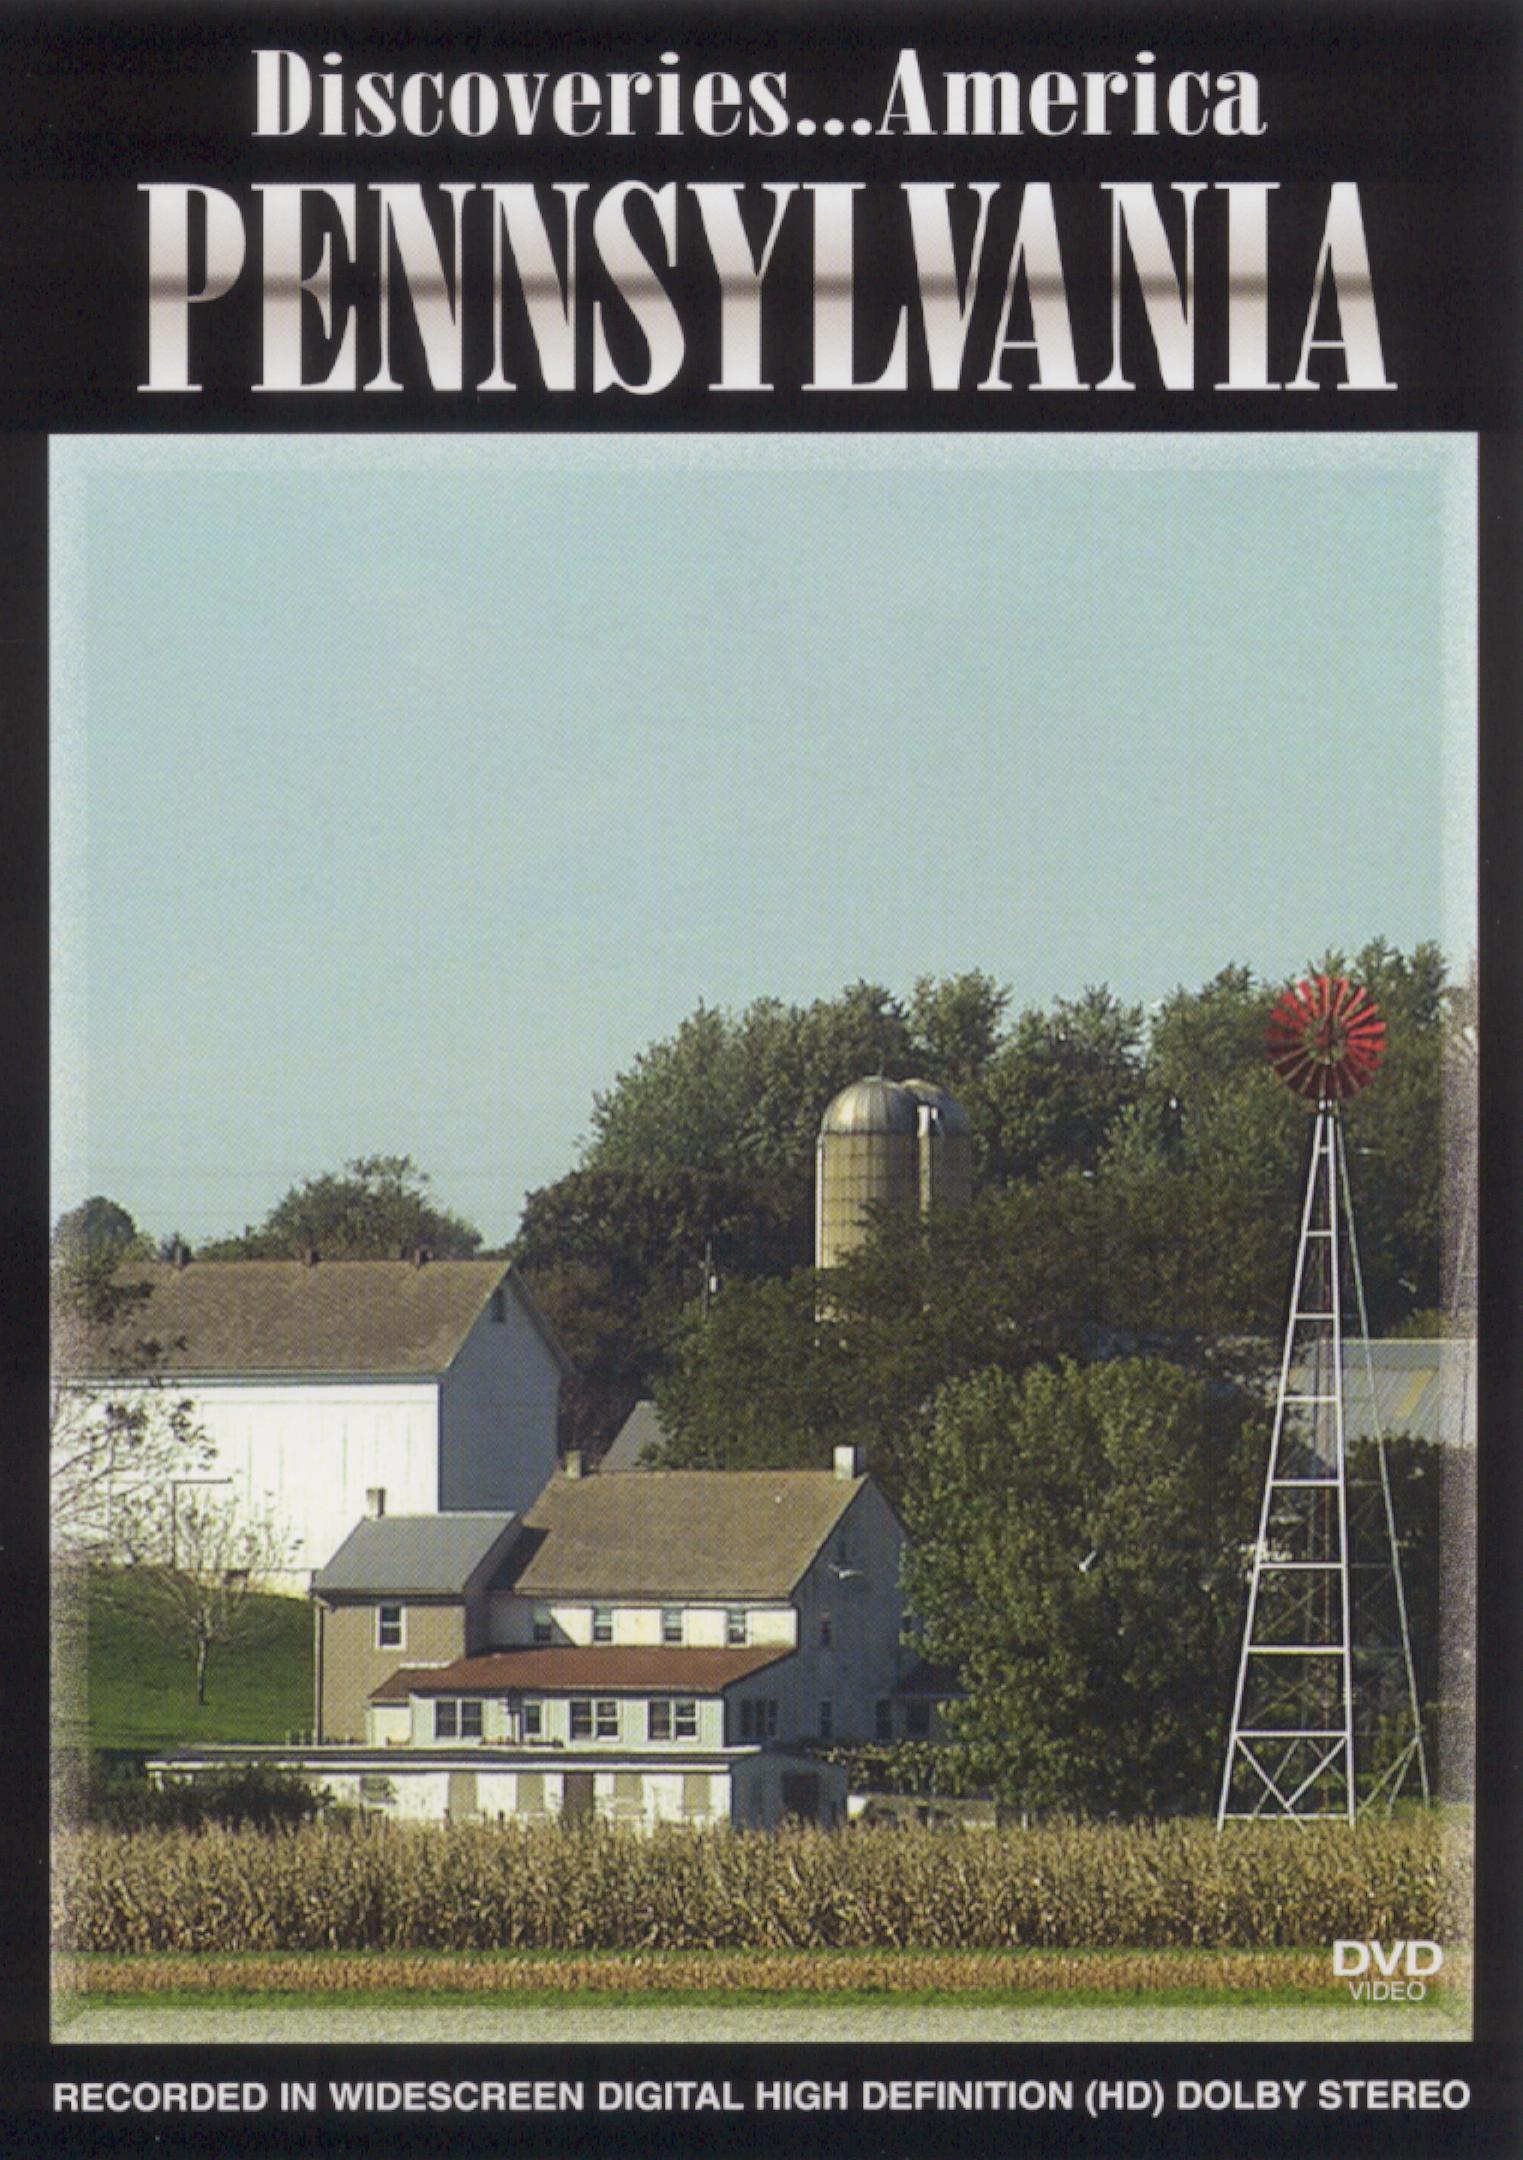 Discoveries... America: Pennsylvania